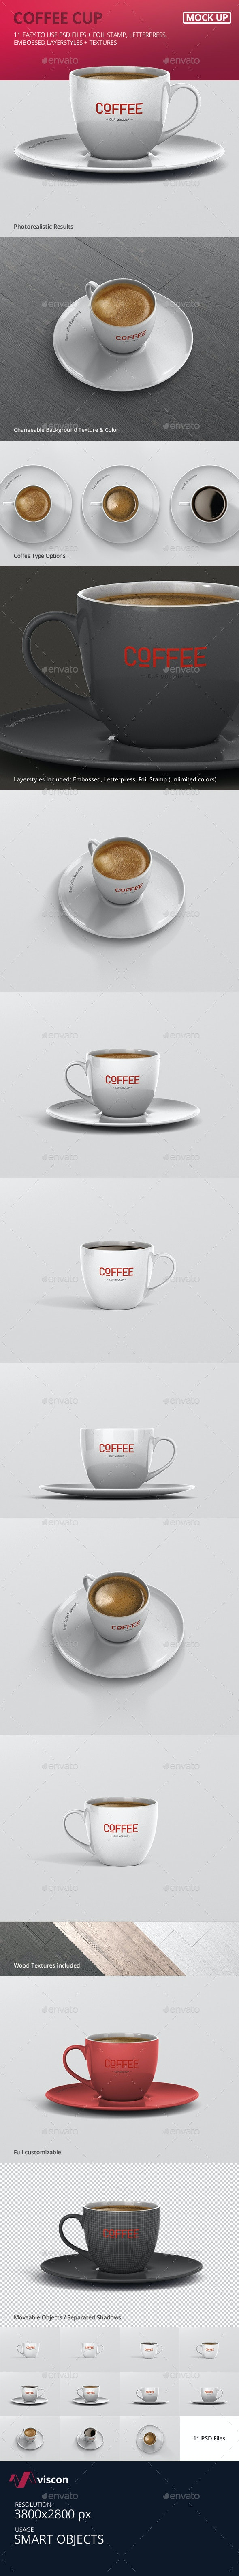 Coffee Cup Mockup - Food and Drink Packaging